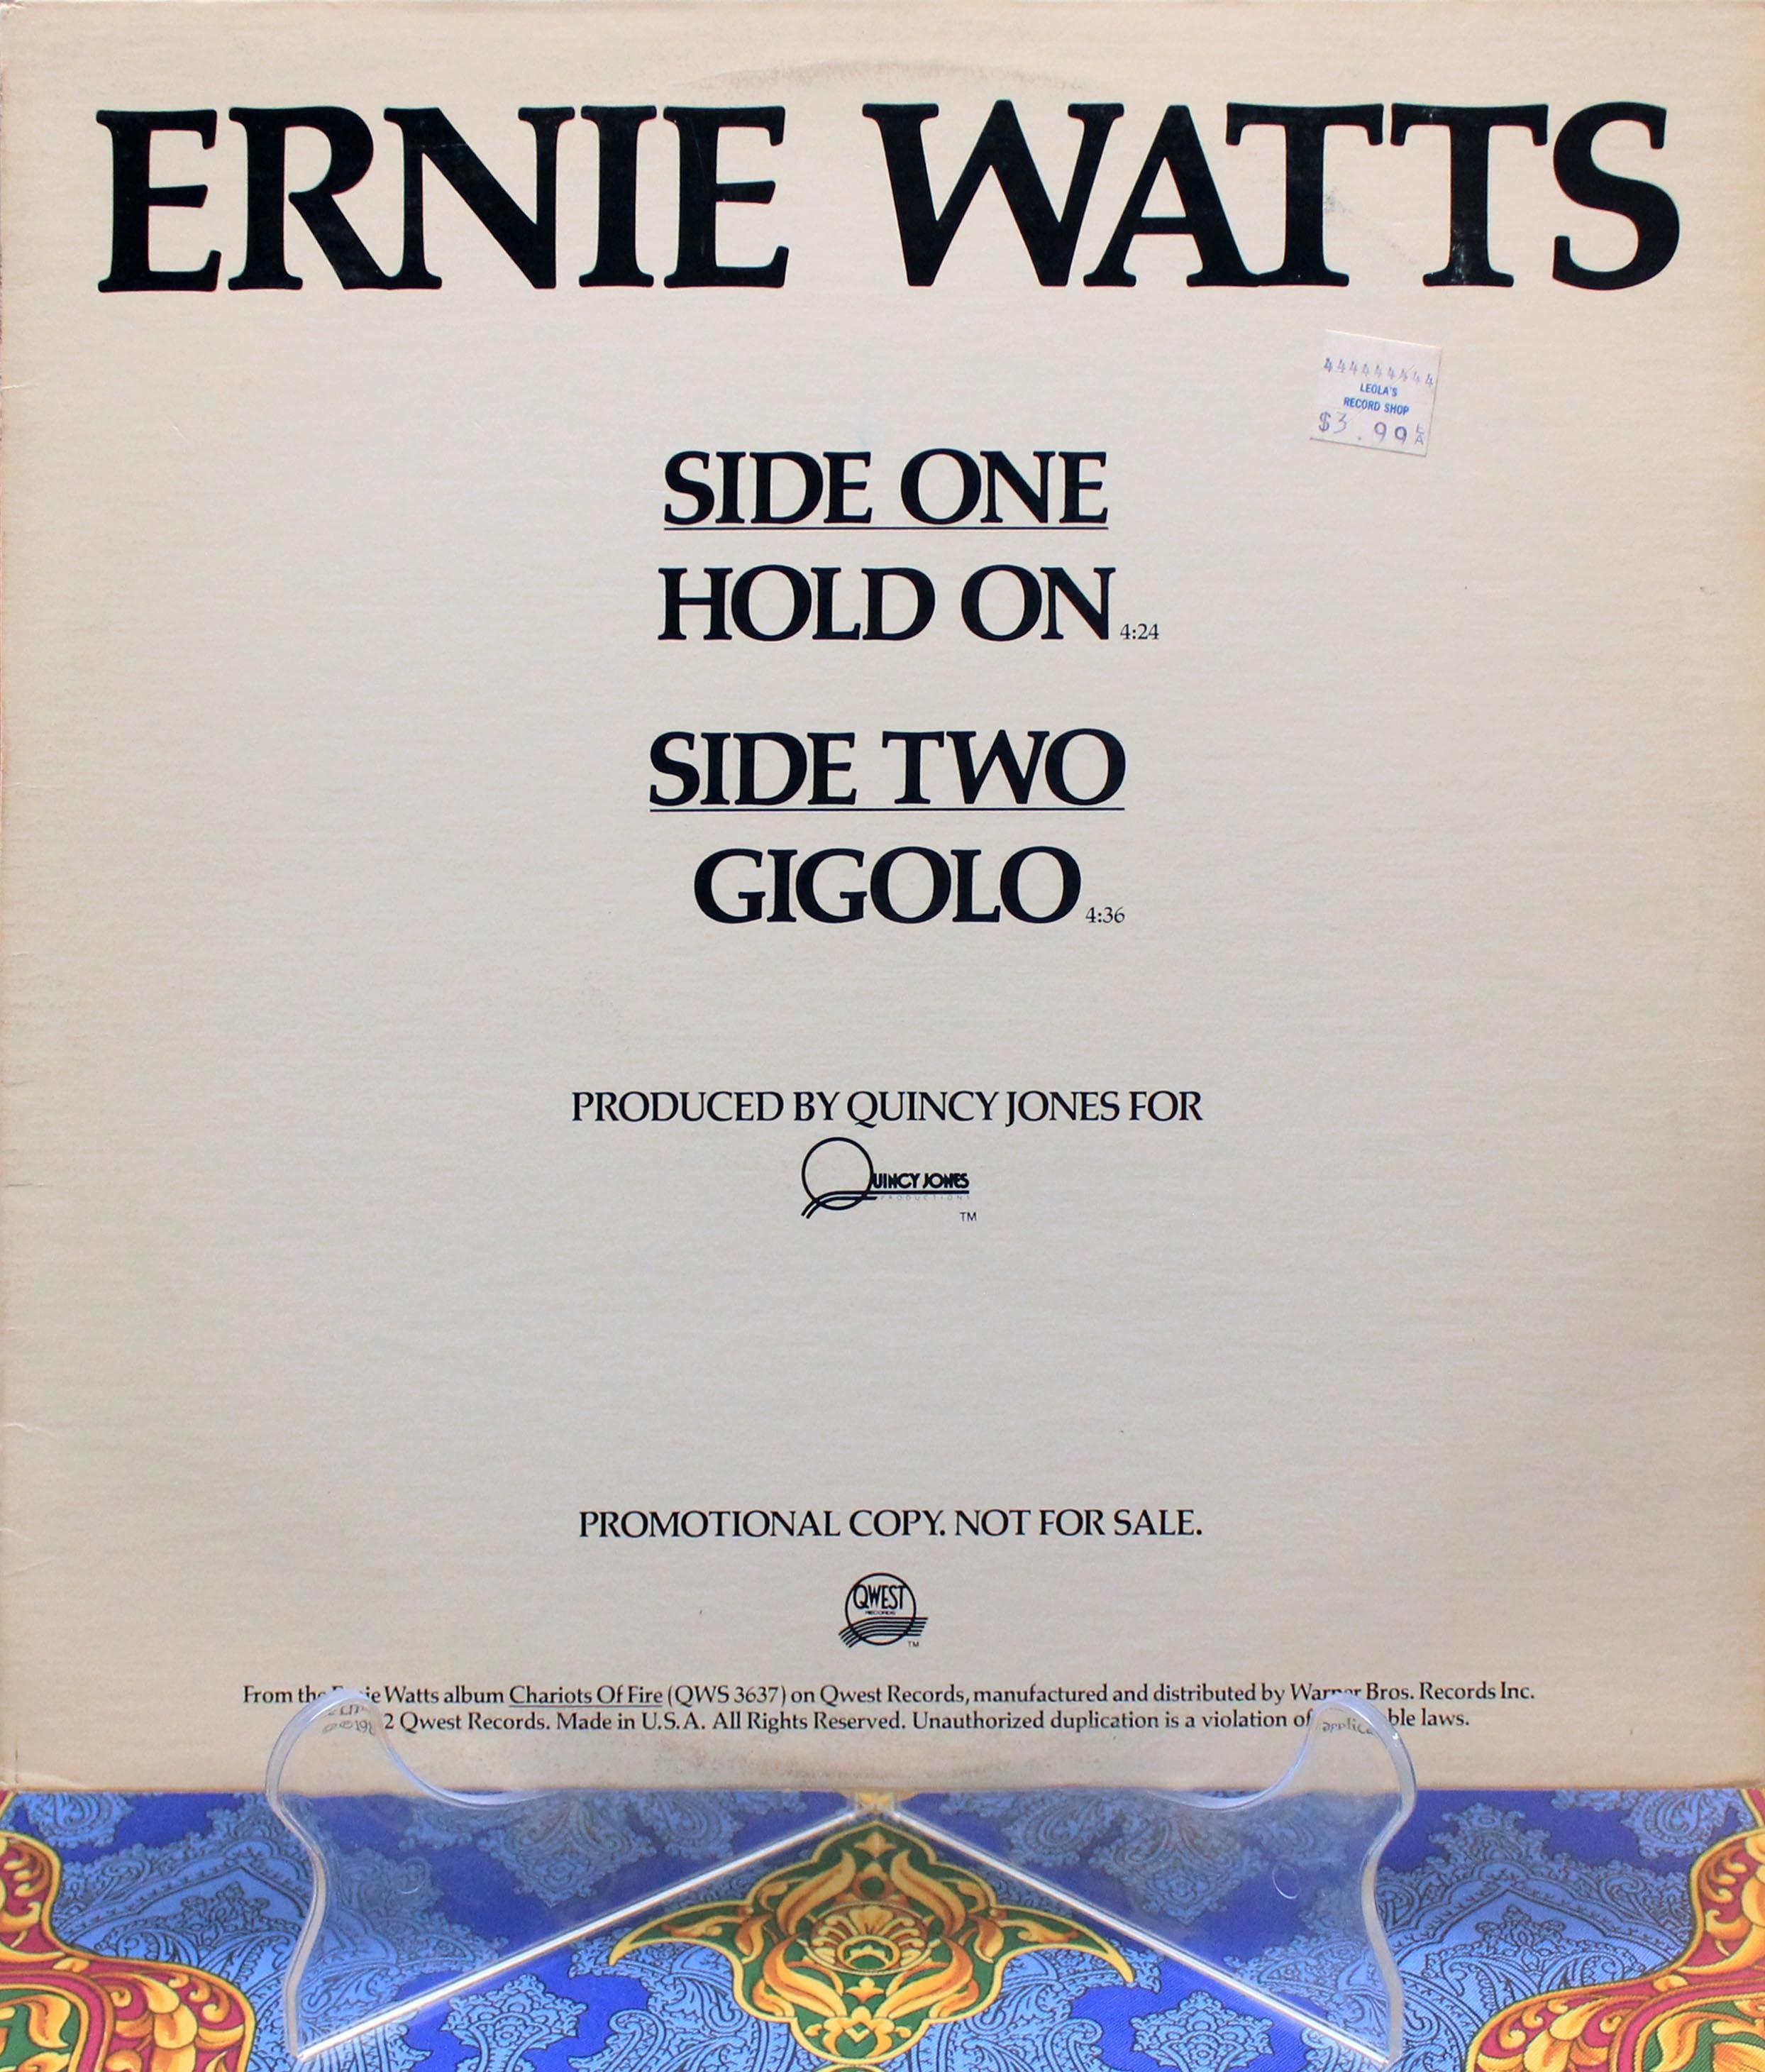 Ernie Watts Gigolo 01